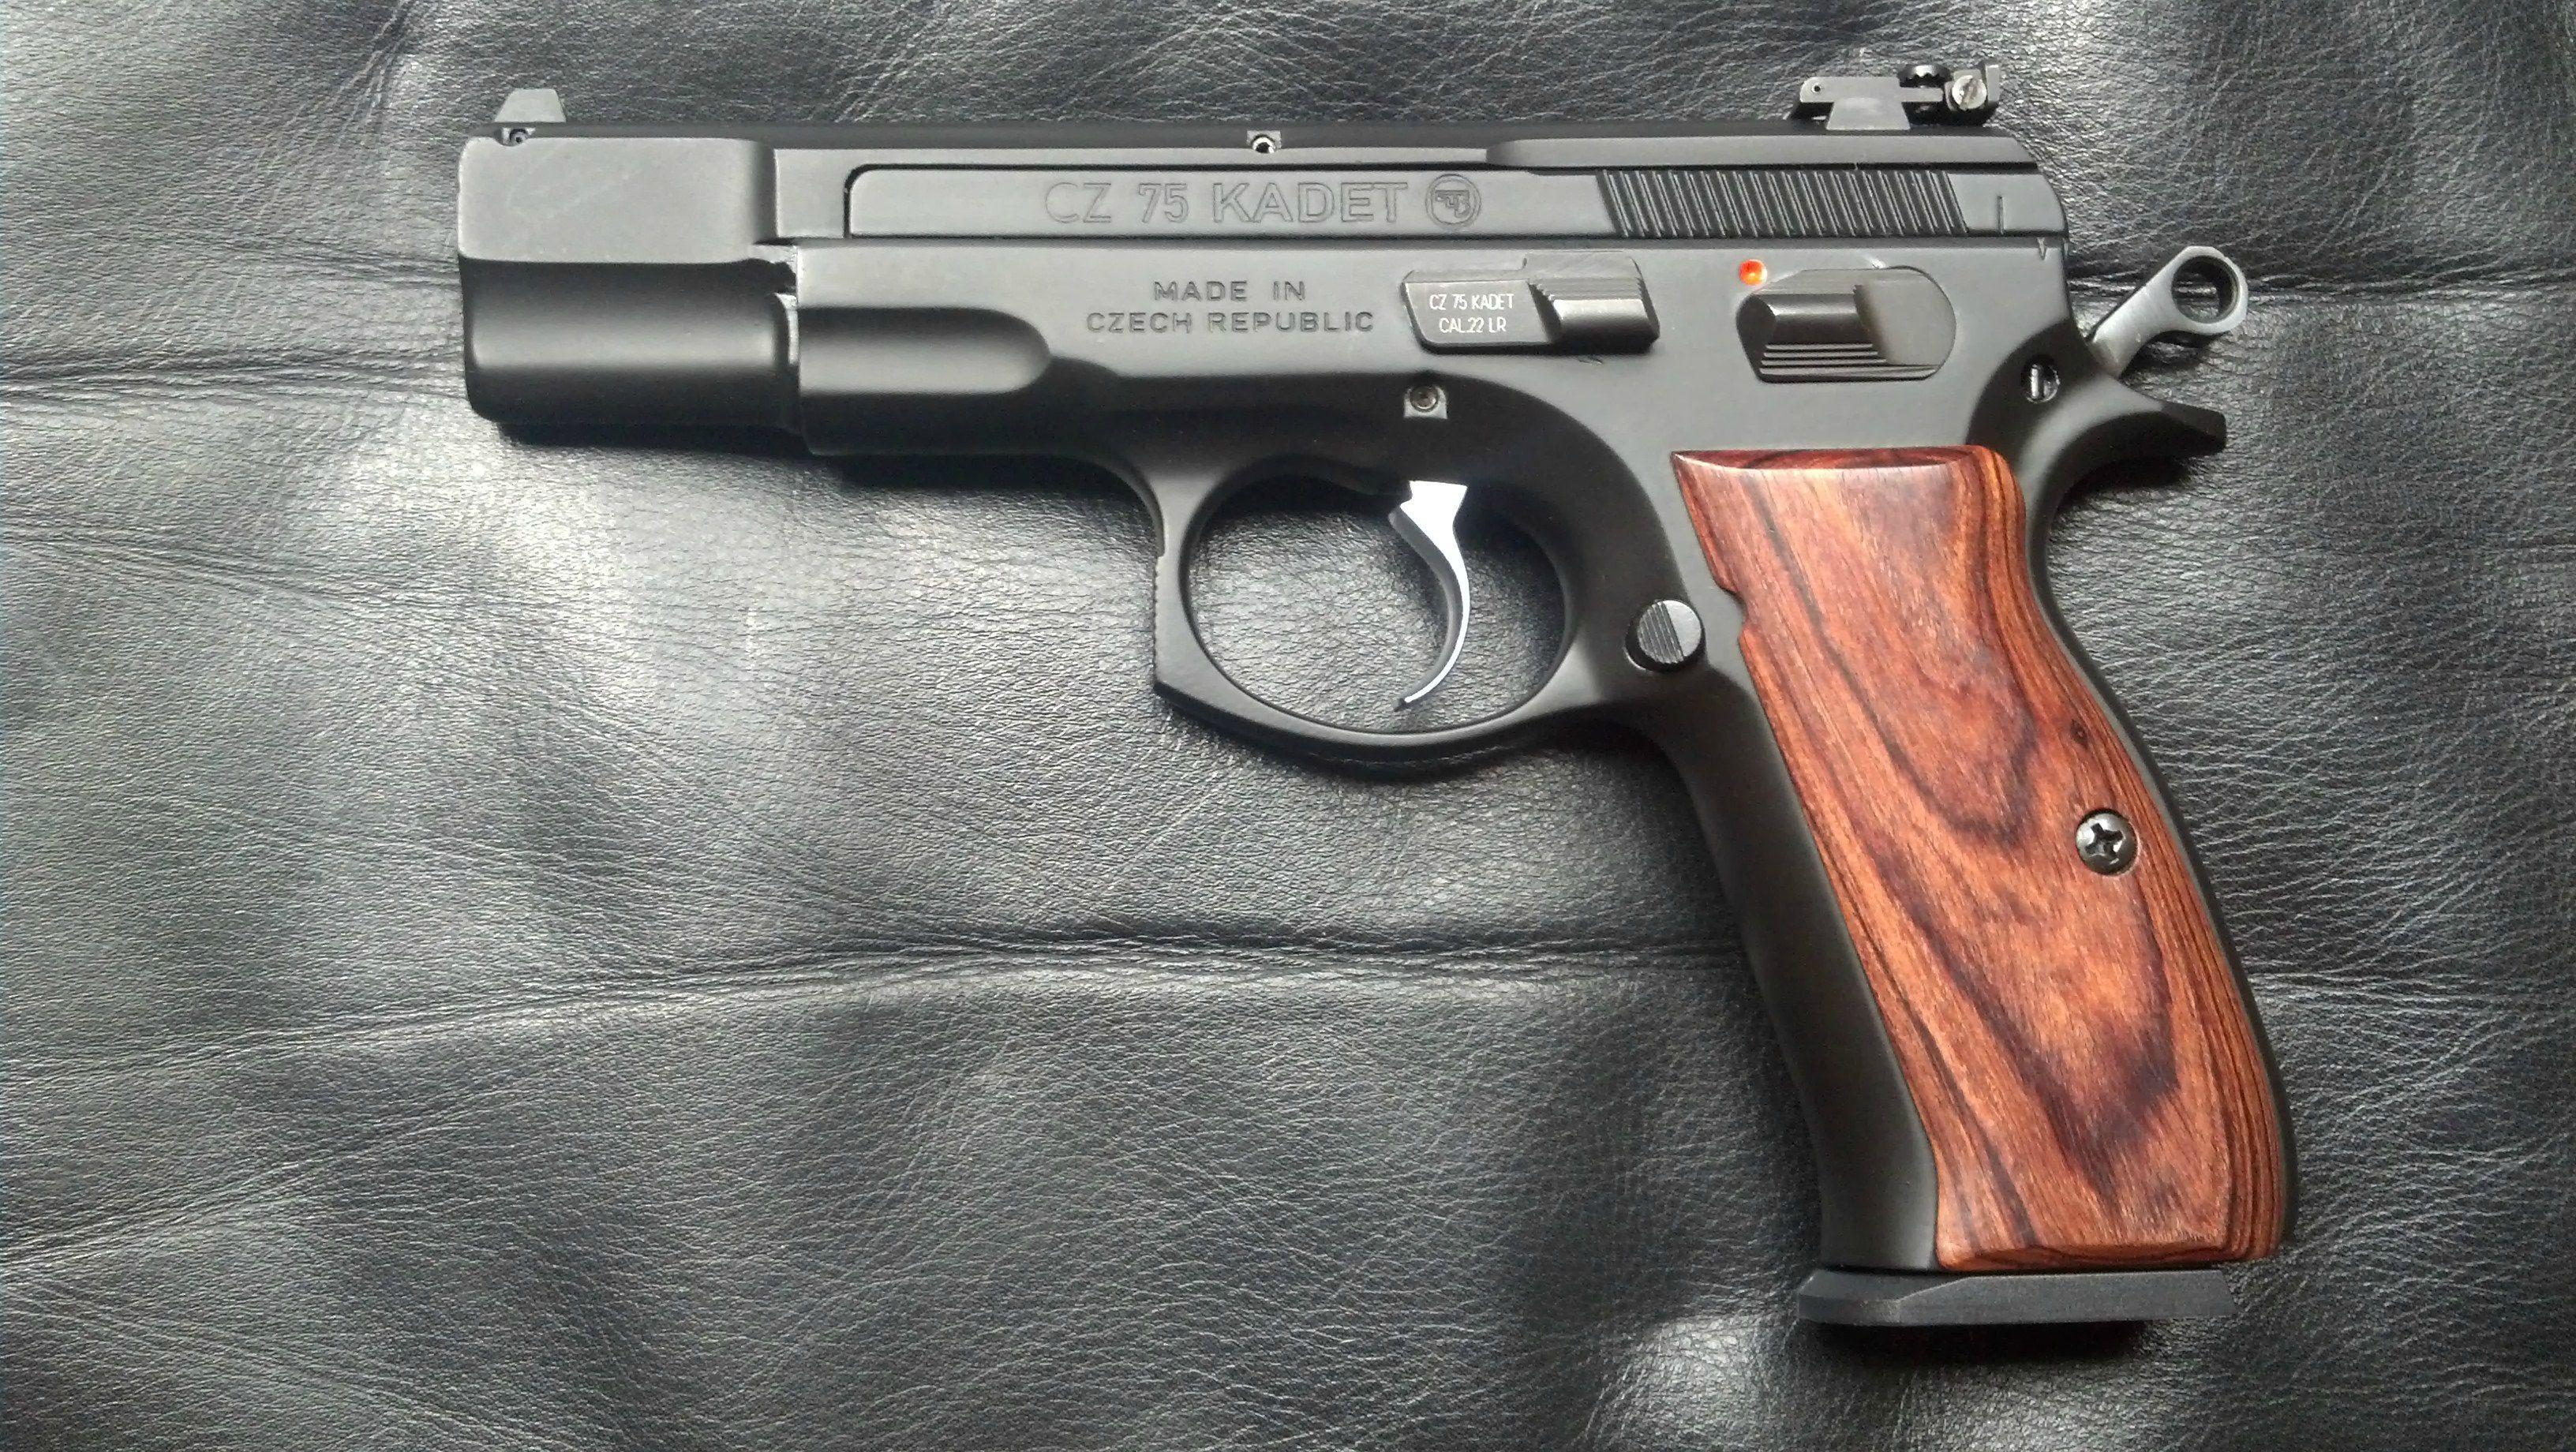 CZ 75 Kadet (Full Pistol)   cz   Rifle accessories, Guns